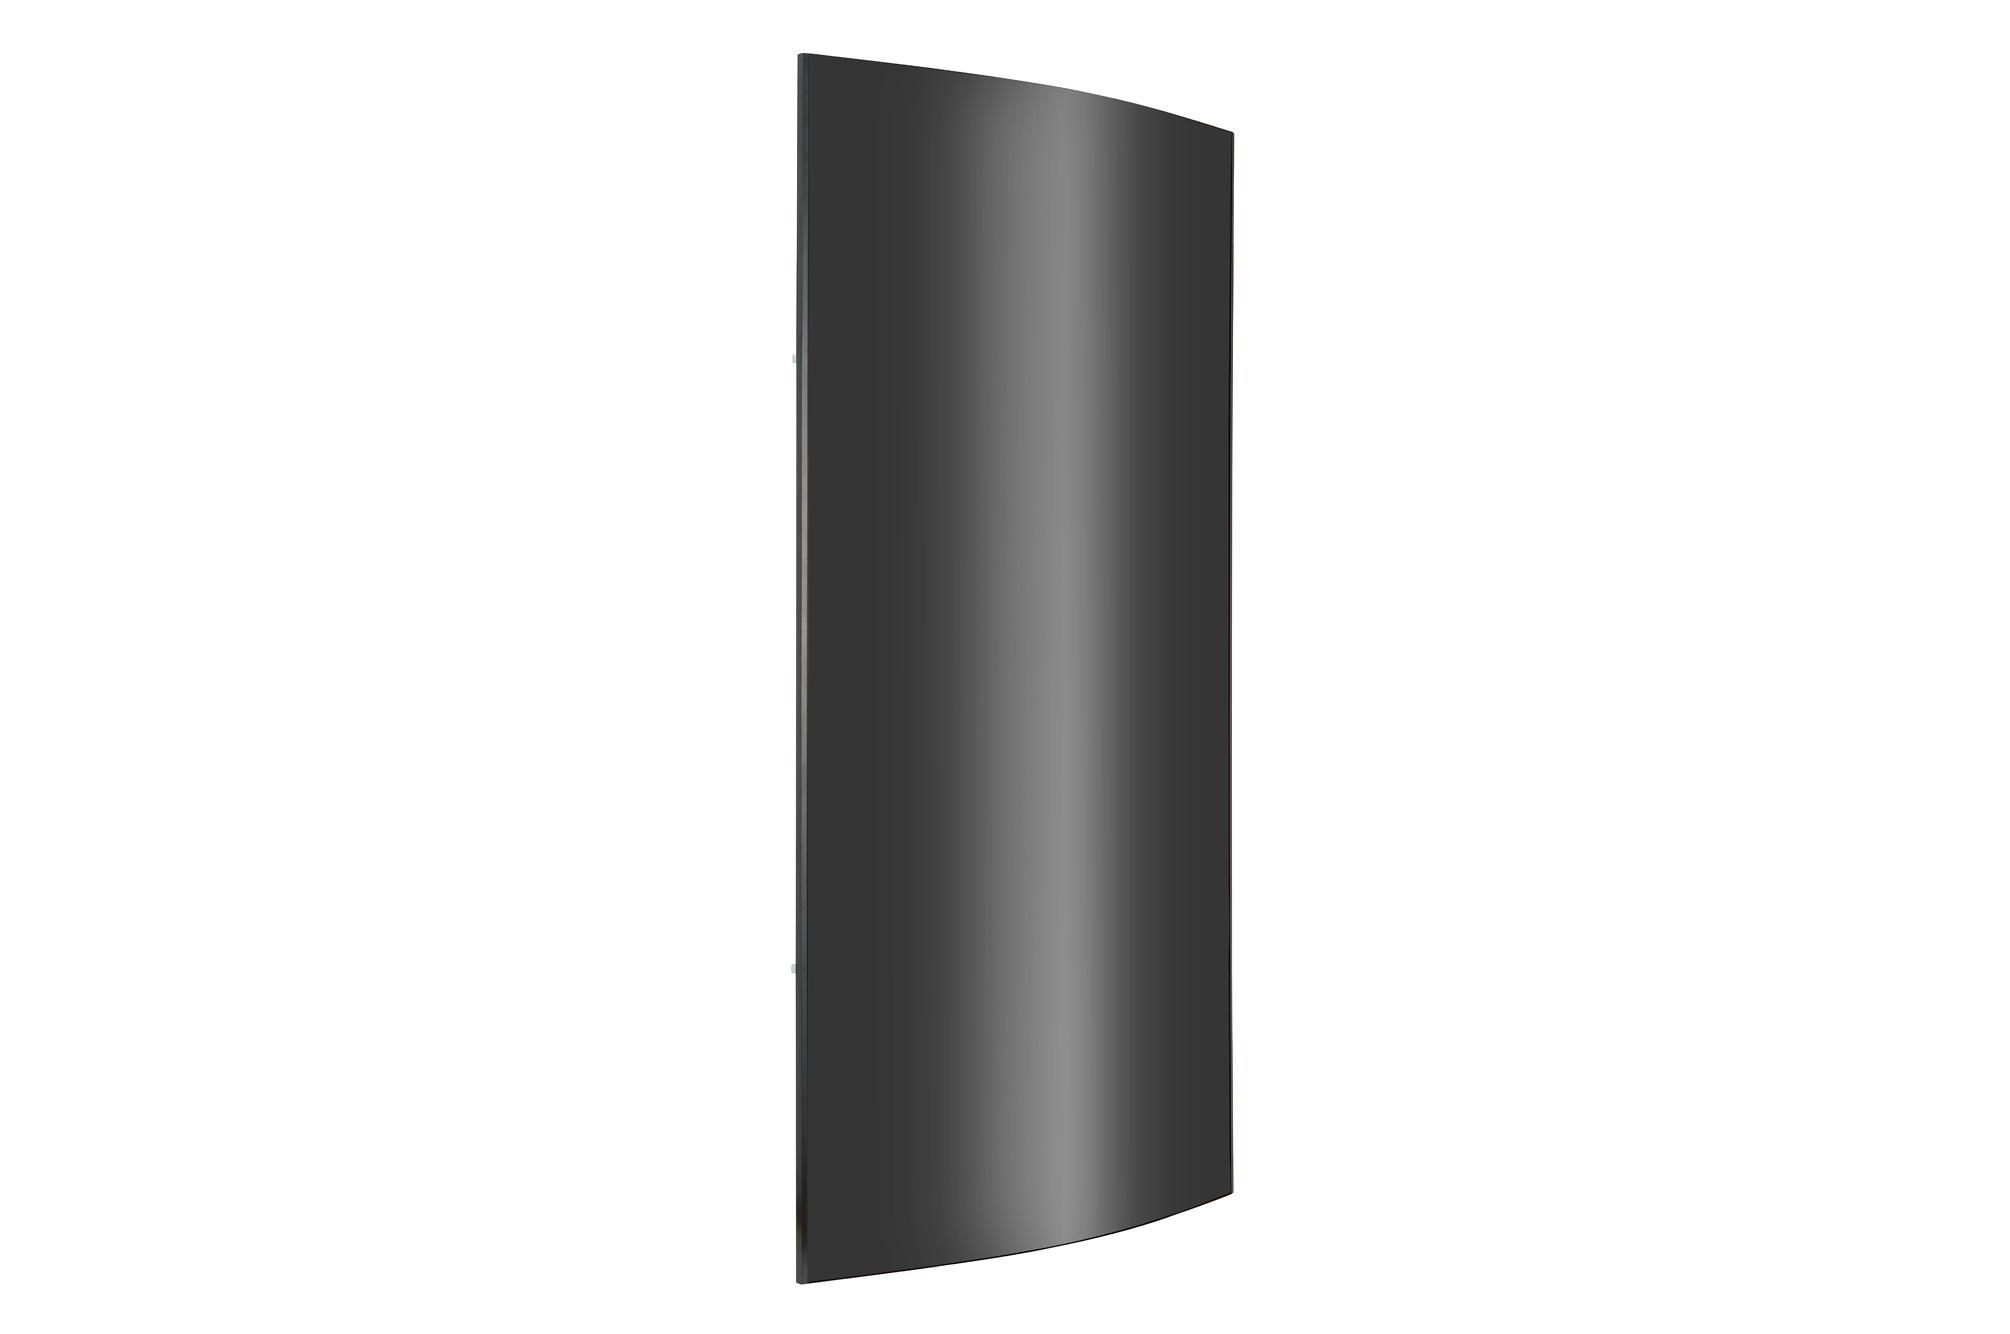 LG Curvable OLED 55EF5F-P 6